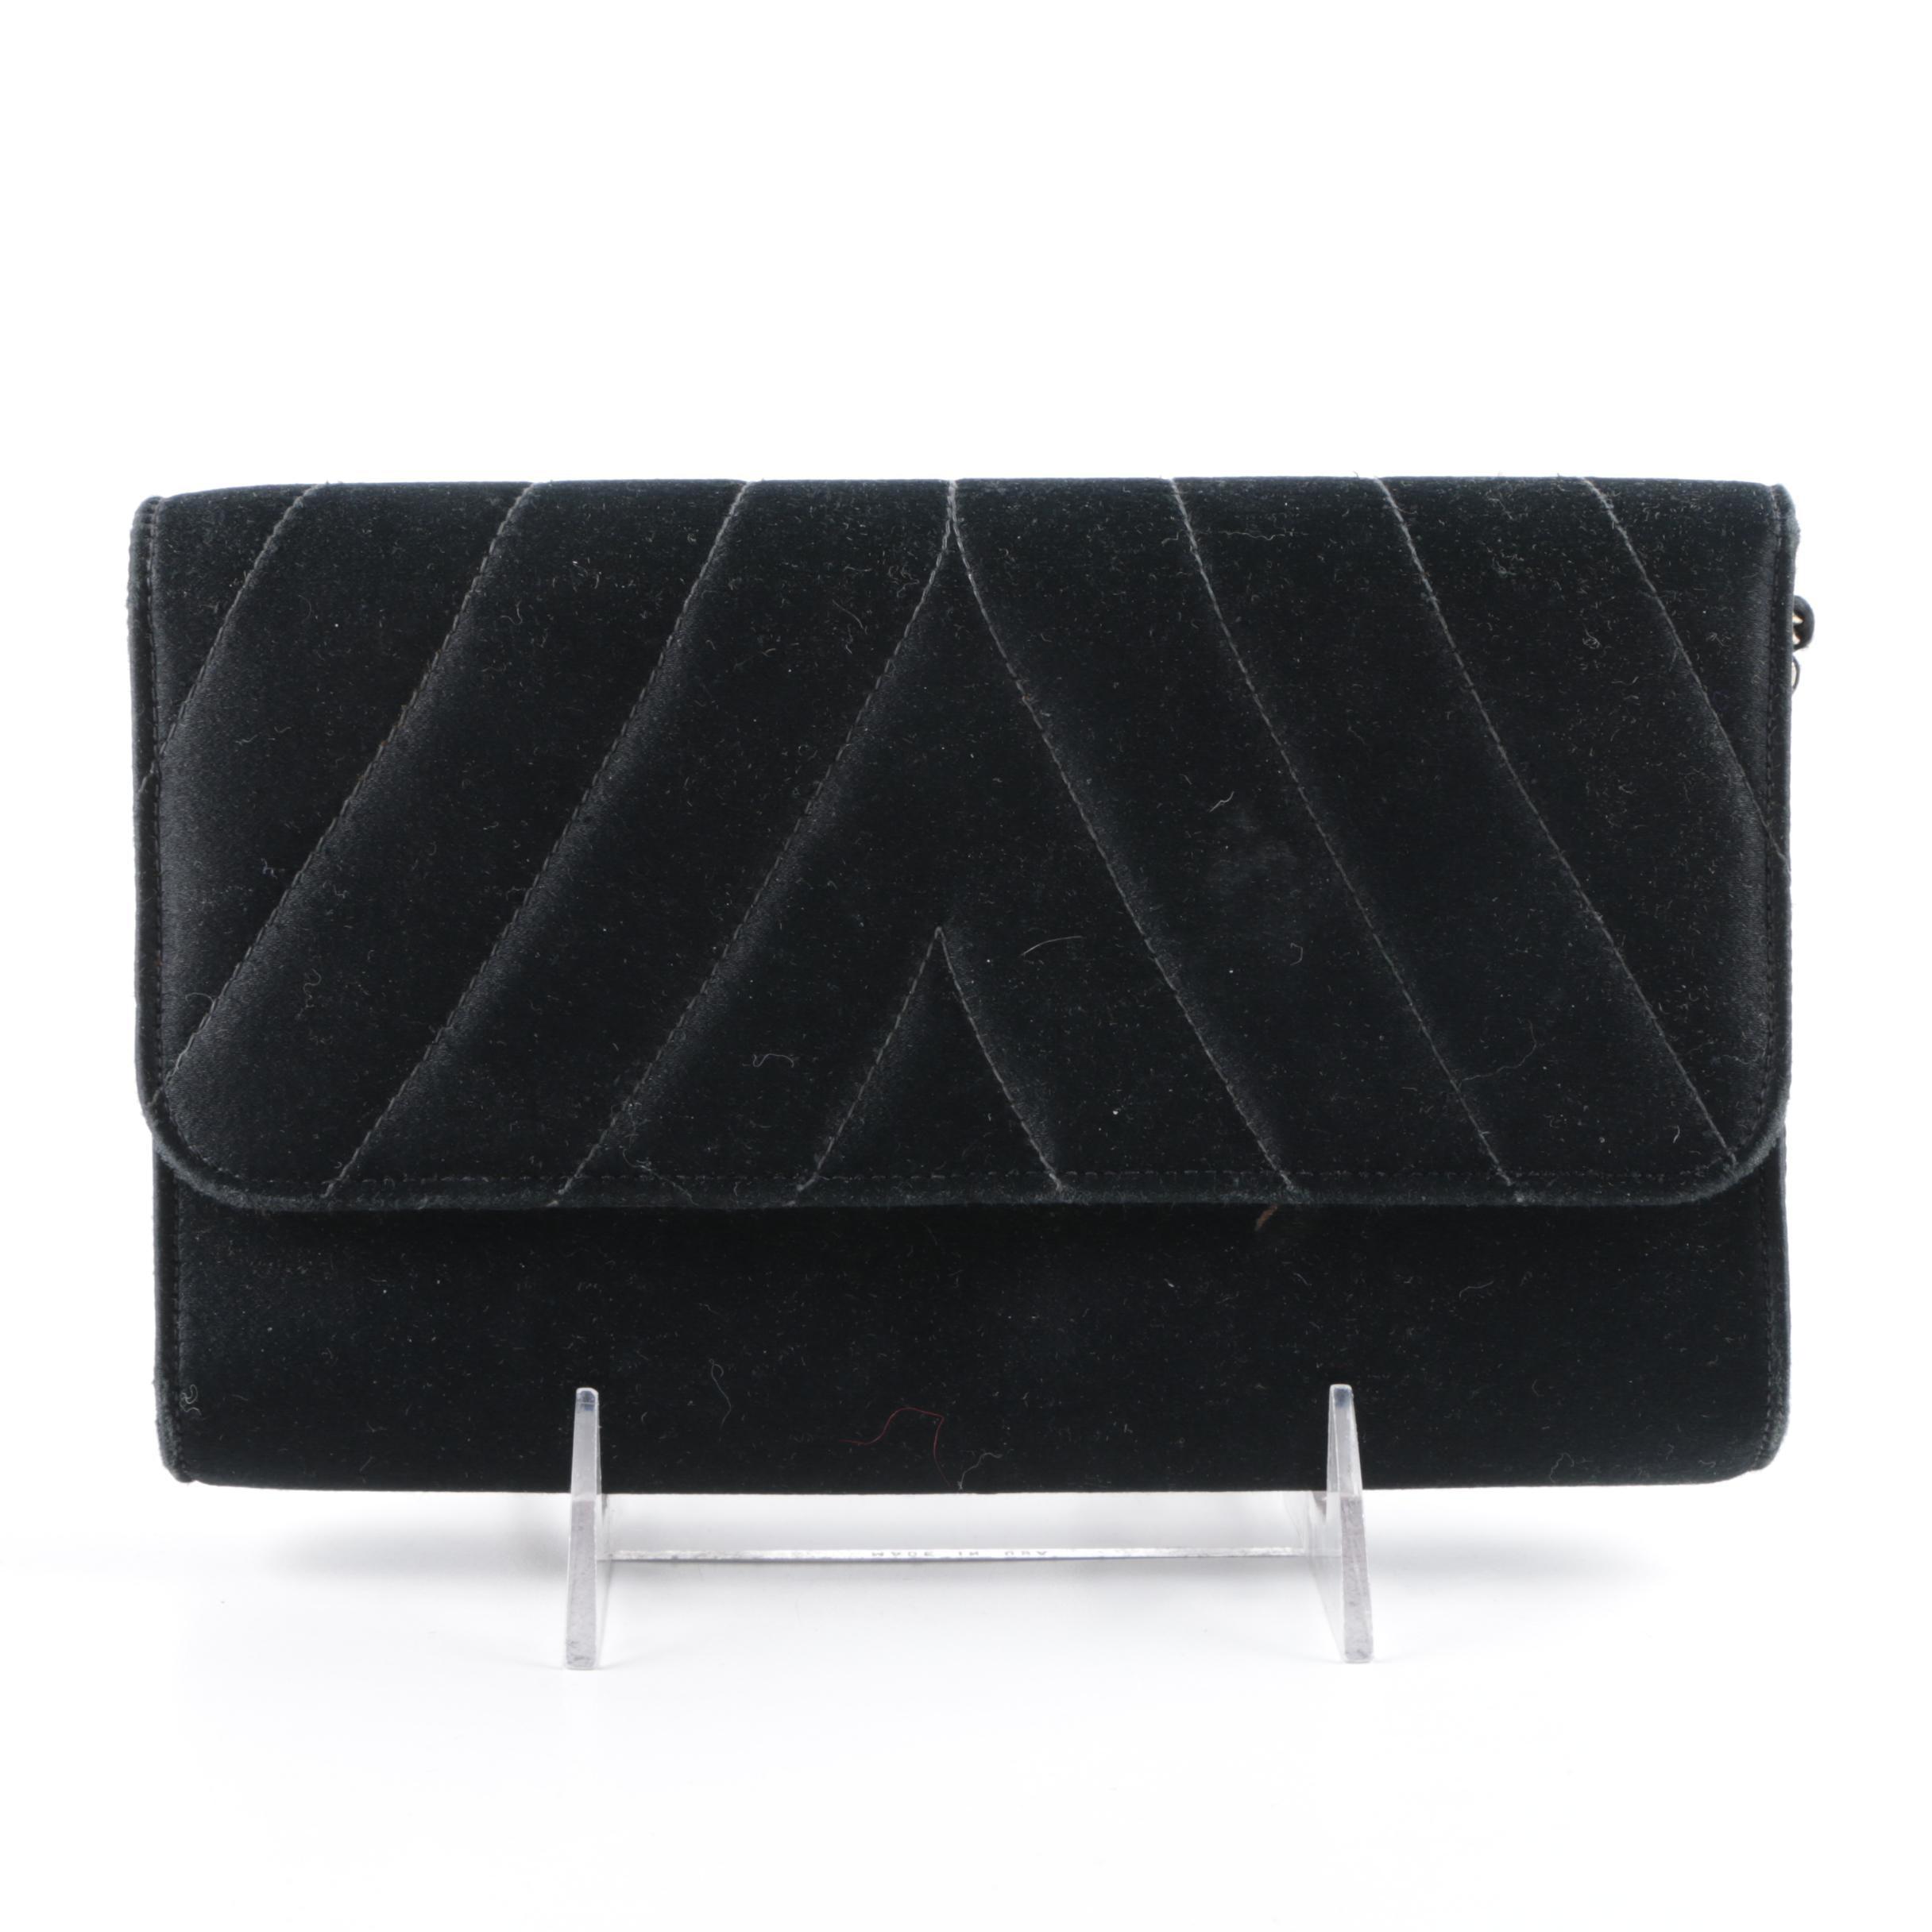 Vintage Lewis Black Clutch Handbag